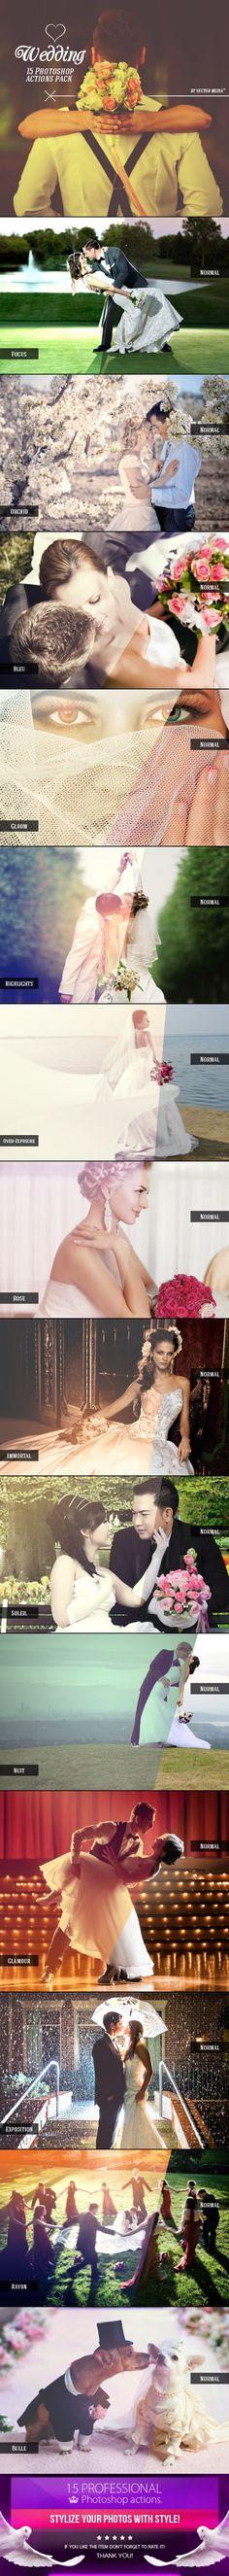 Wedding - Photoshop Actions #photoeffects #design Download: http://graphicriver.net/item/wedding-photoshop-actions/9212060?ref=ksioks